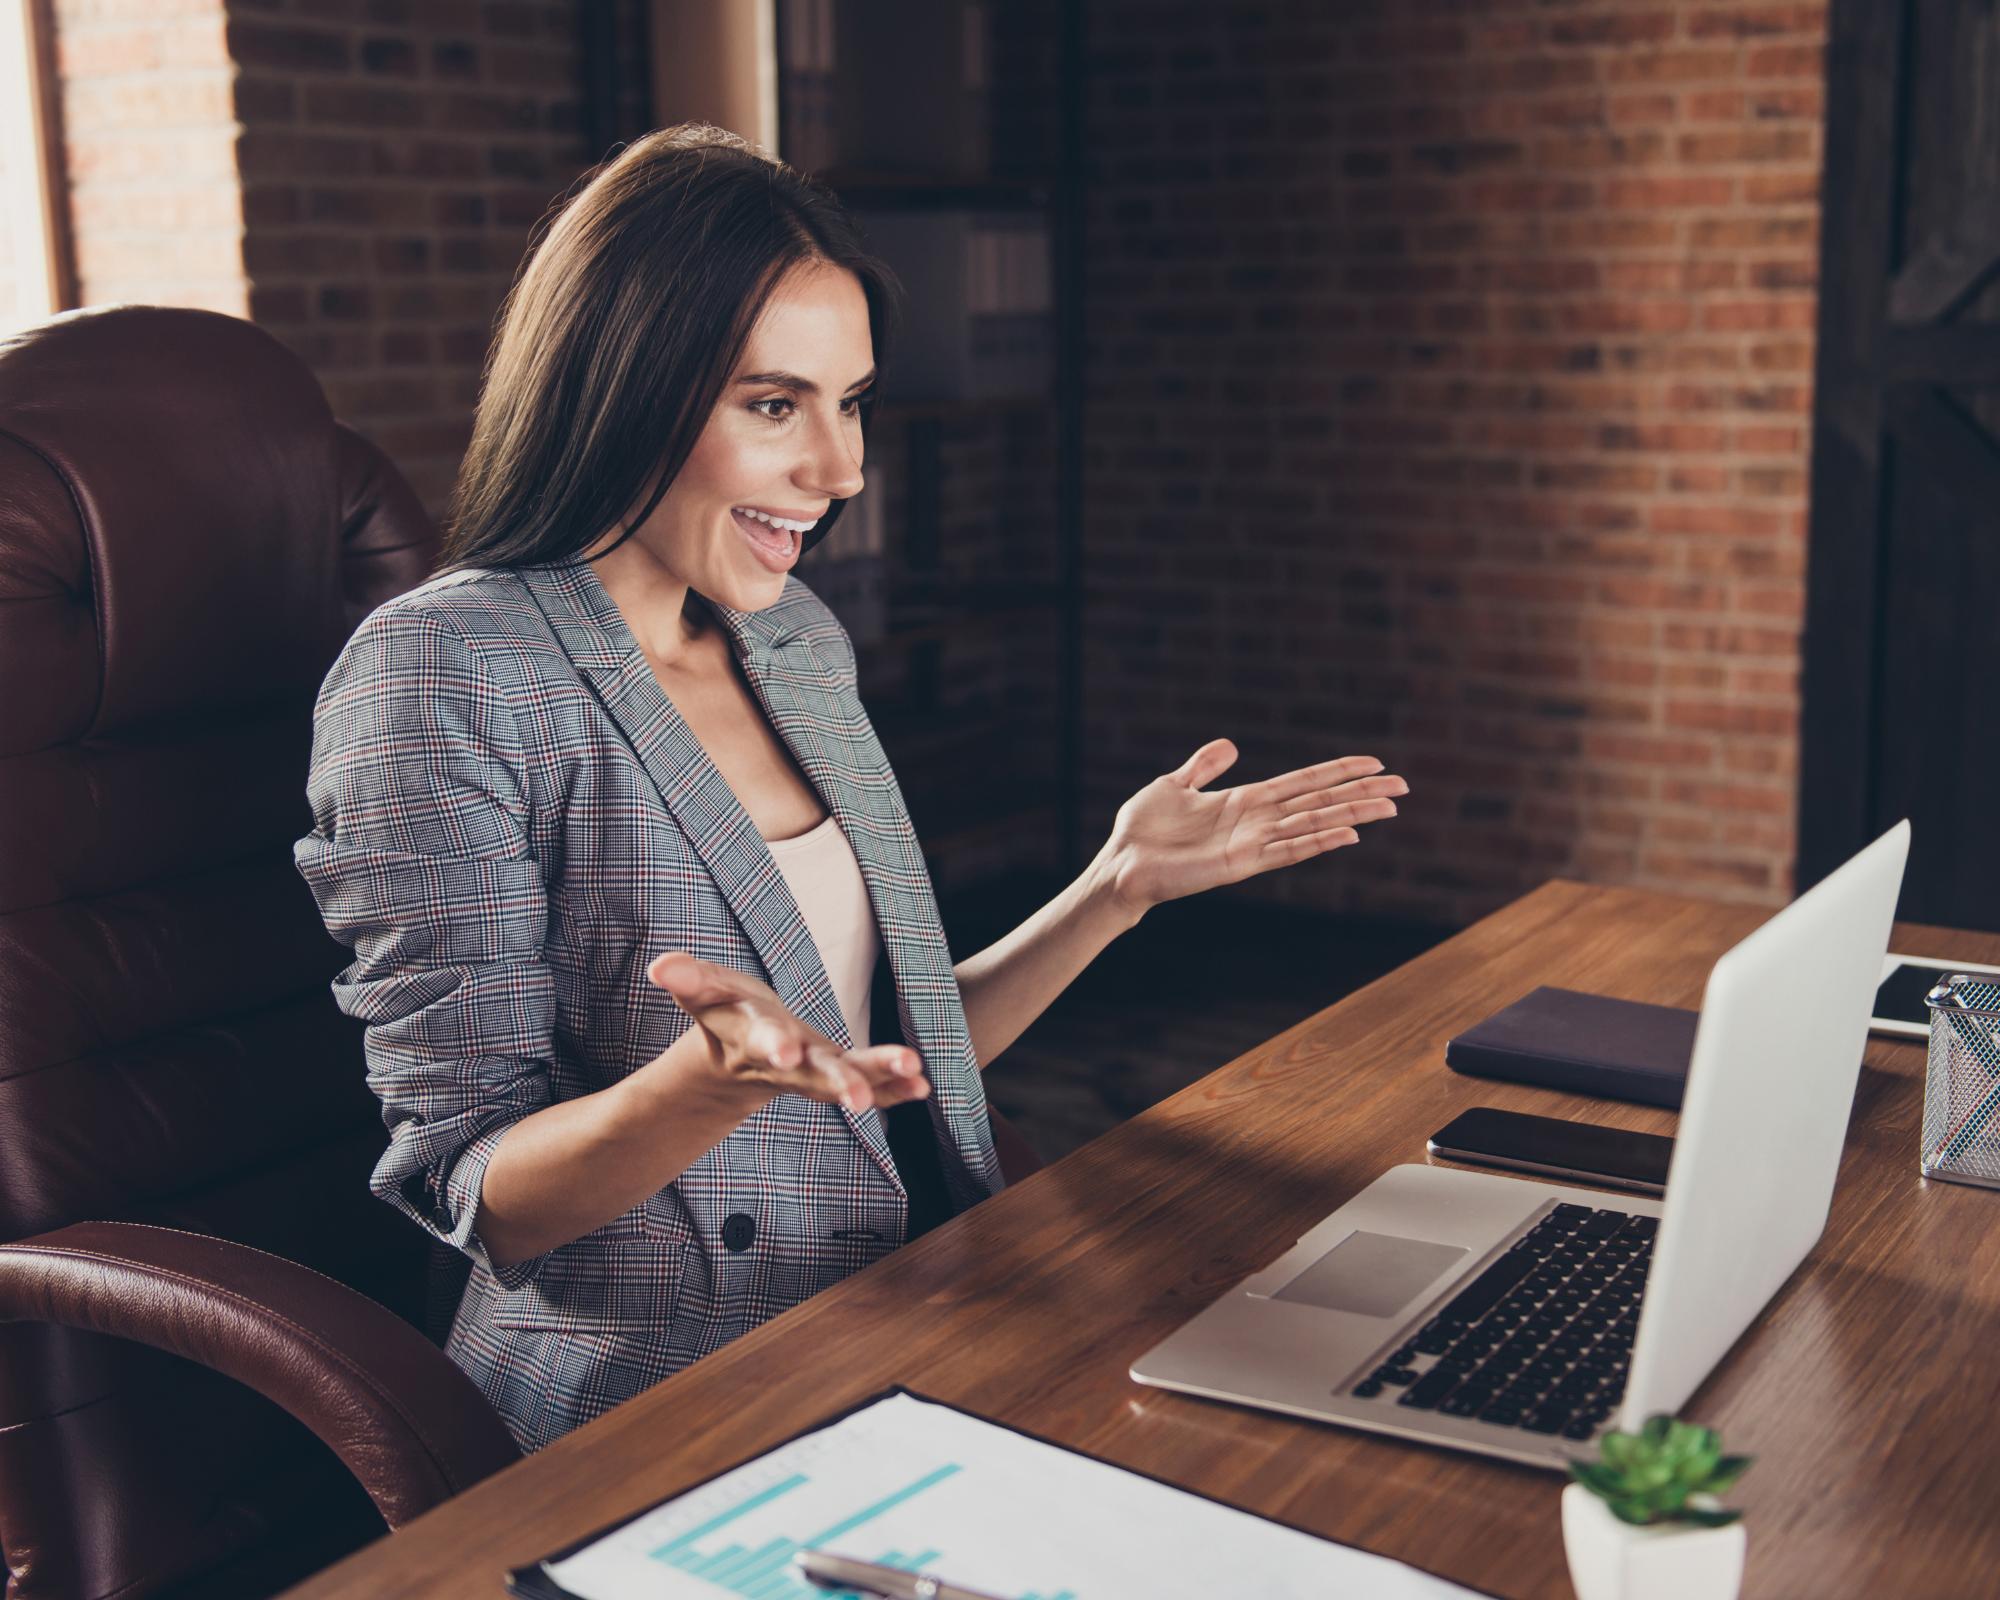 Business woman talking in virtual meeting working on presentation skills basics.